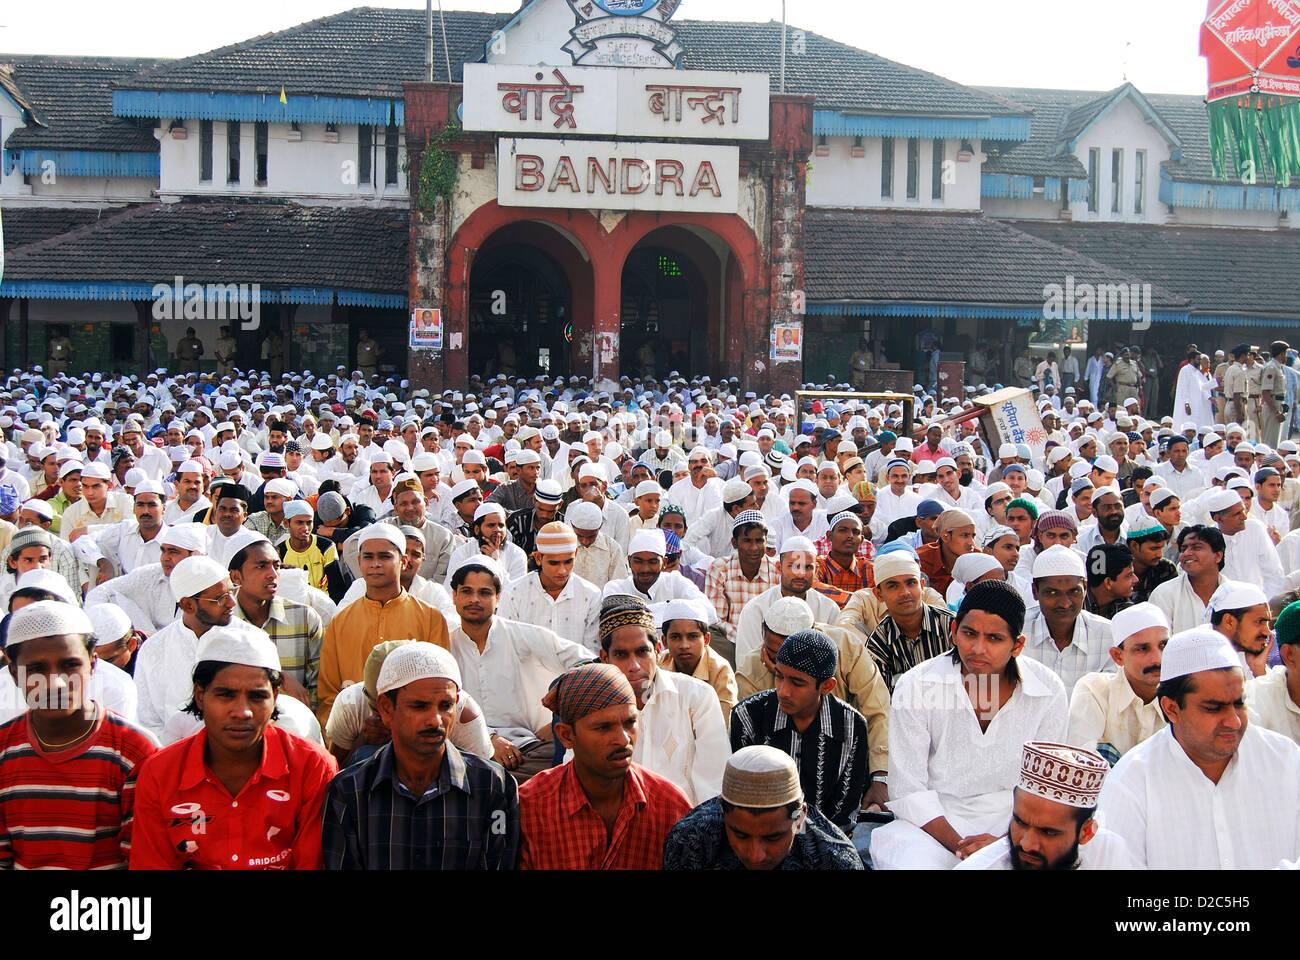 Muslims Sitting For Namaz On Id-Ul-Fitr On Ramzan Id At Bandra Station, Bombay Mumbai, Maharashtra, India - Stock Image